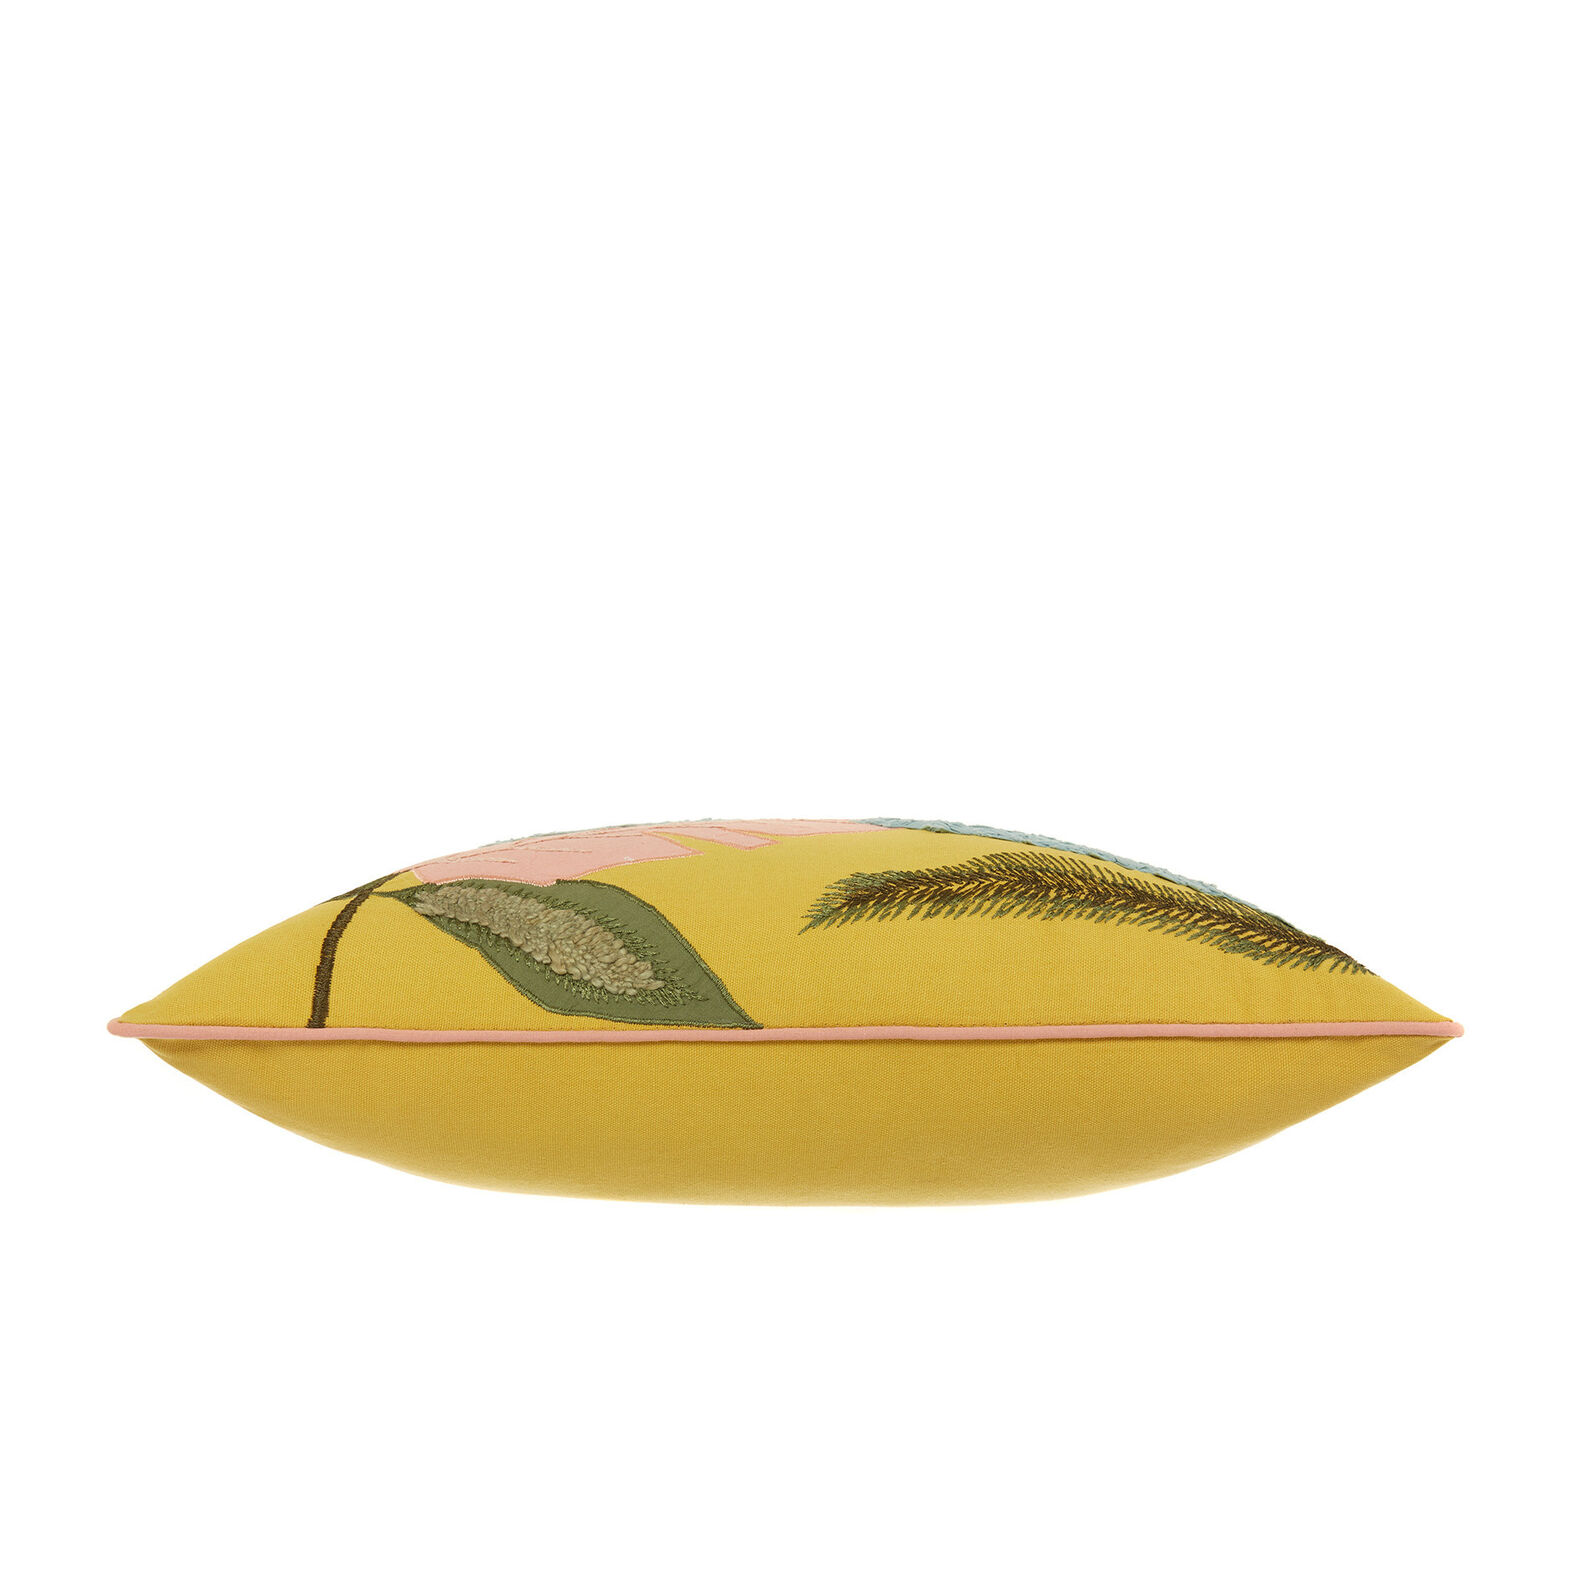 Cuscino ricamo foglie 45x45cm